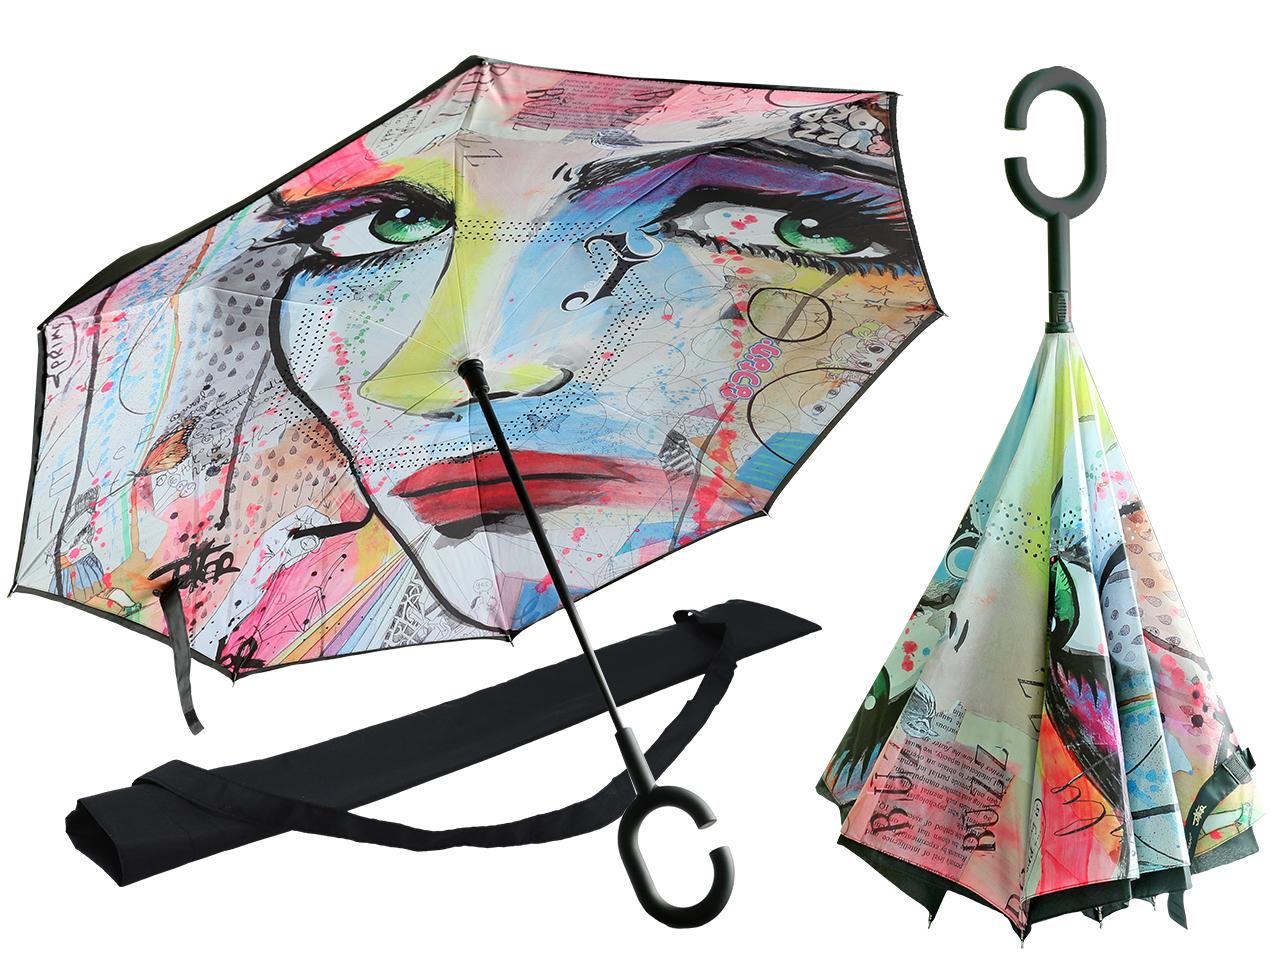 Mestres da pintura-Loui Jover-Chapéu de chuva